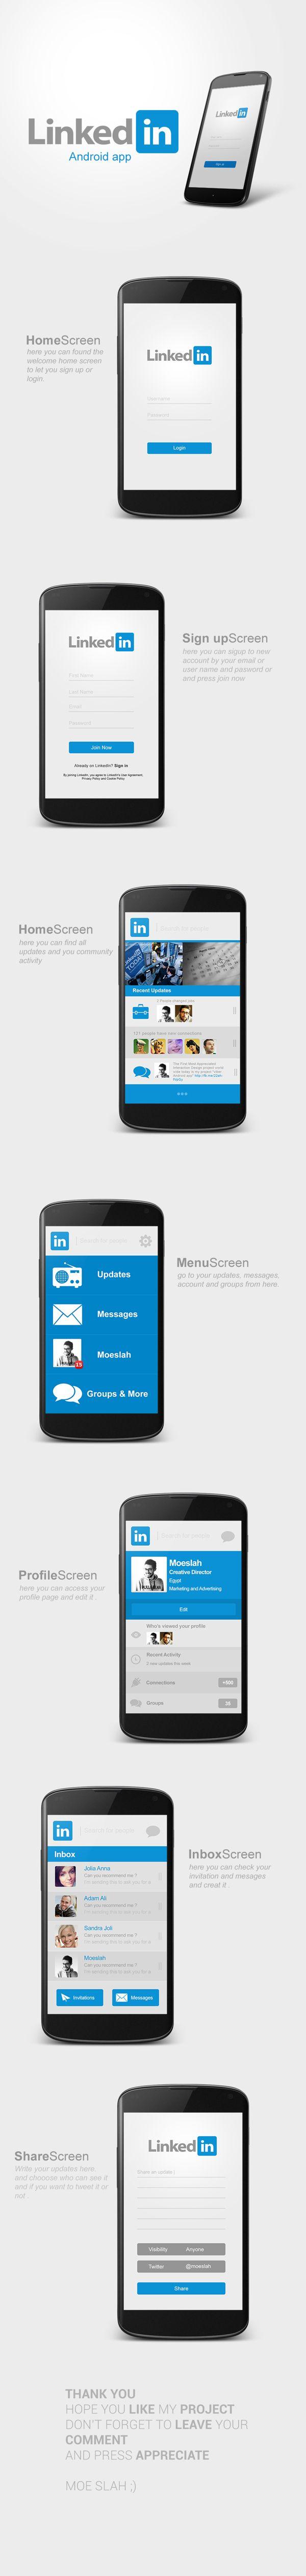 LinkedIn Android App Re-design by Moe slah, via Behance